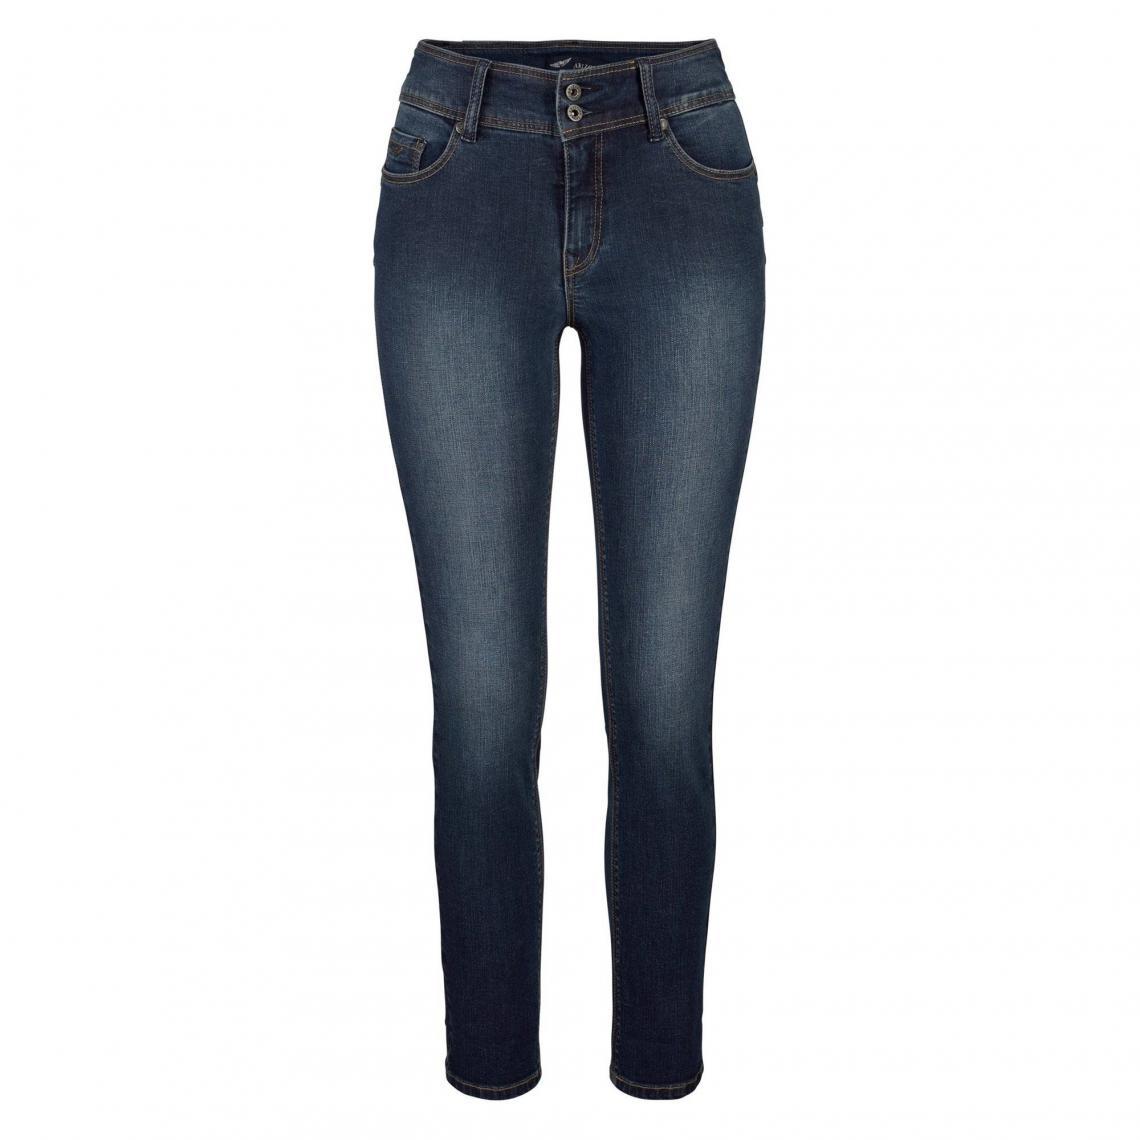 95ab18ad1af4 Jean slim fit taille haute stretch femme Ankle Arizona - Bleu Arizona